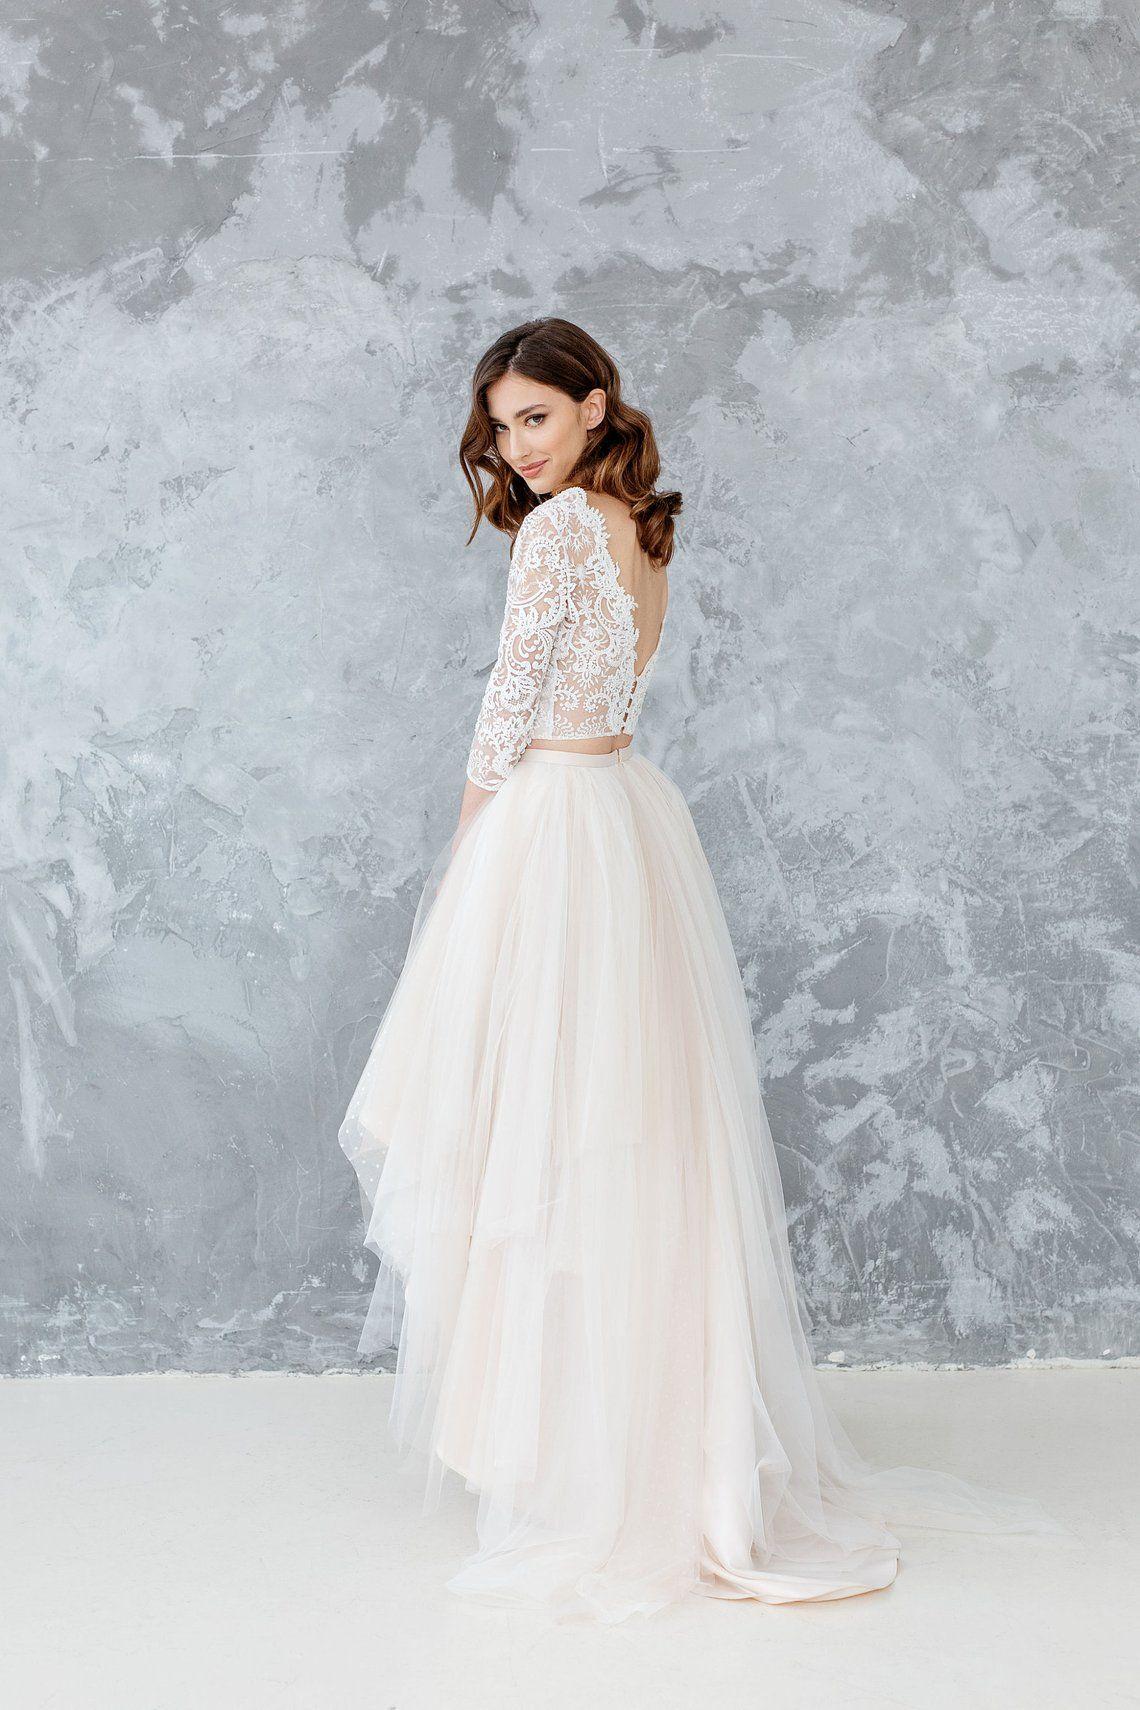 Ivory Lace Wedding Top Astrid Bridal Crop Top With With Etsy In 2020 Crop Top Wedding Dress Top Wedding Dresses Bridal Crop Top